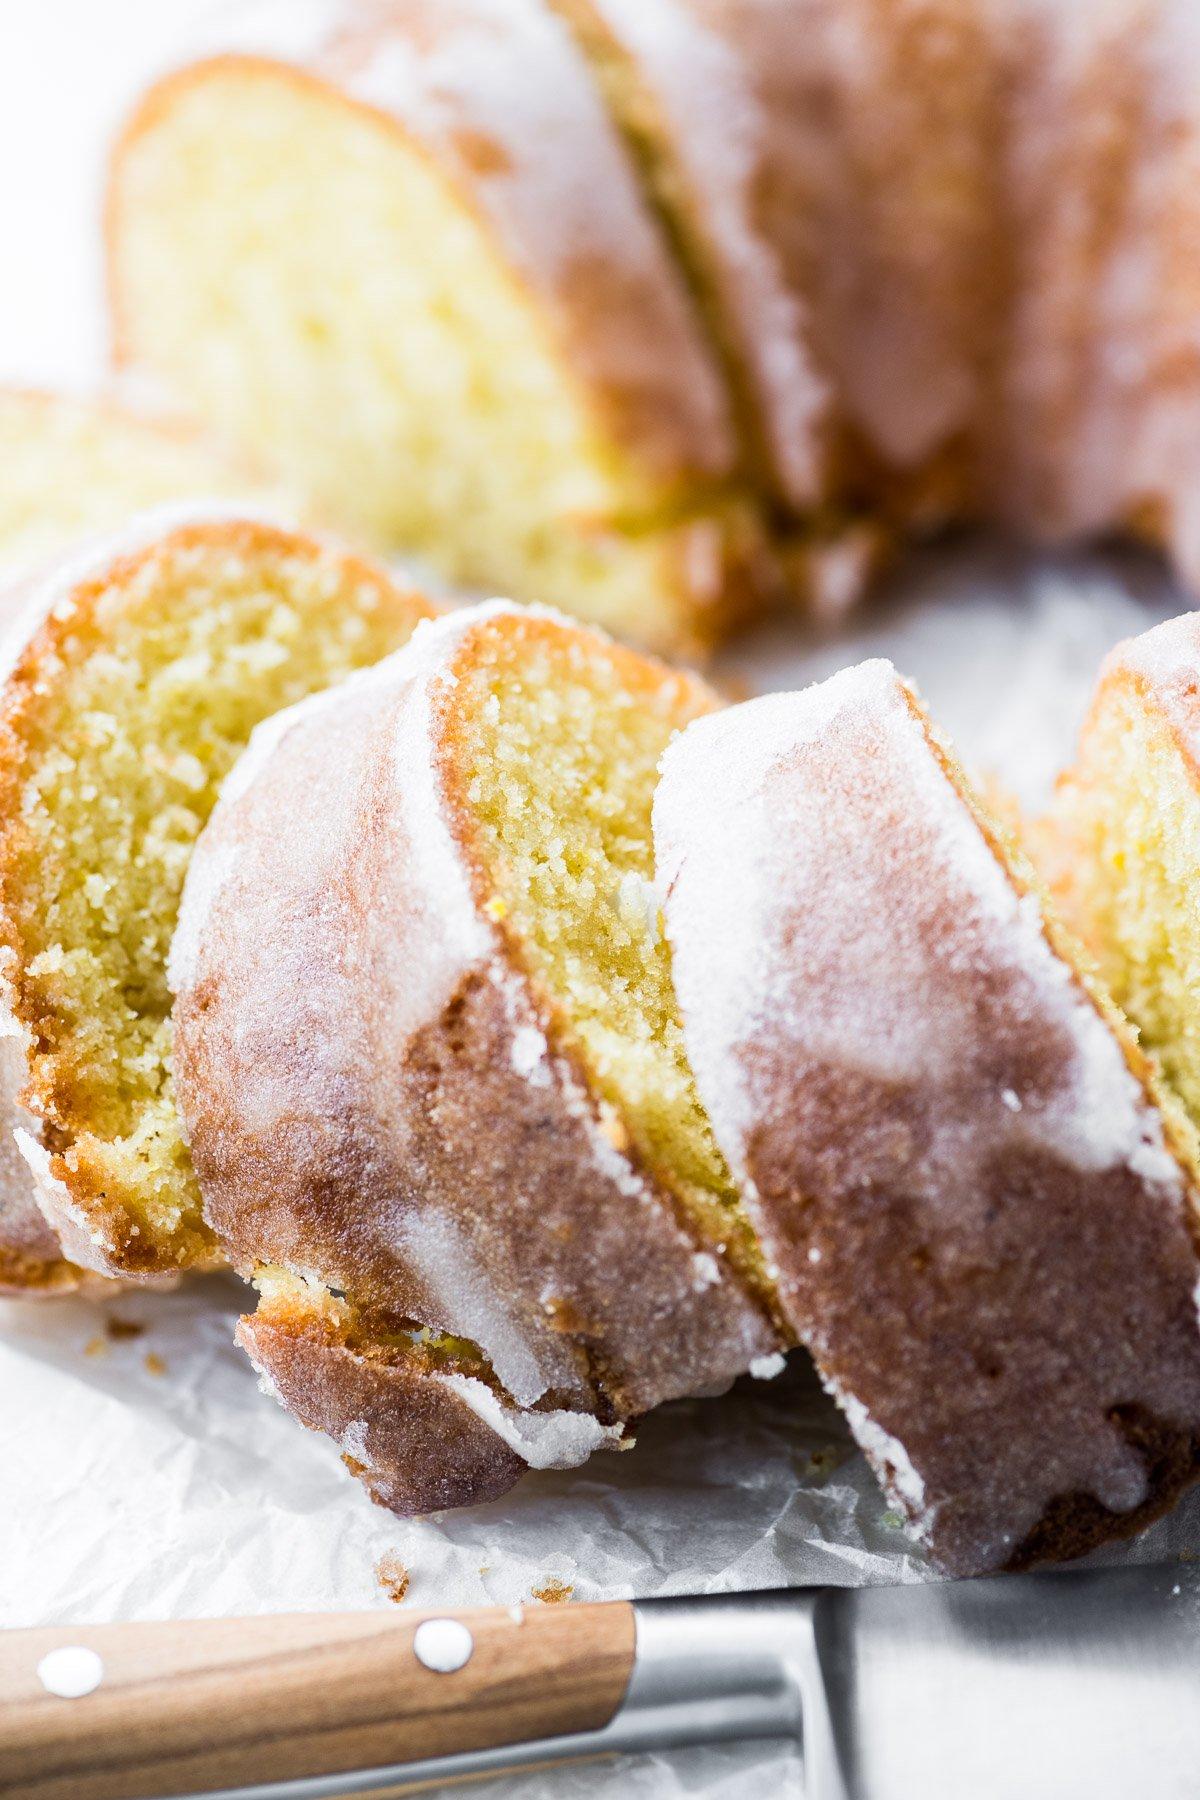 Lemon bundt cake, sliced, with knive